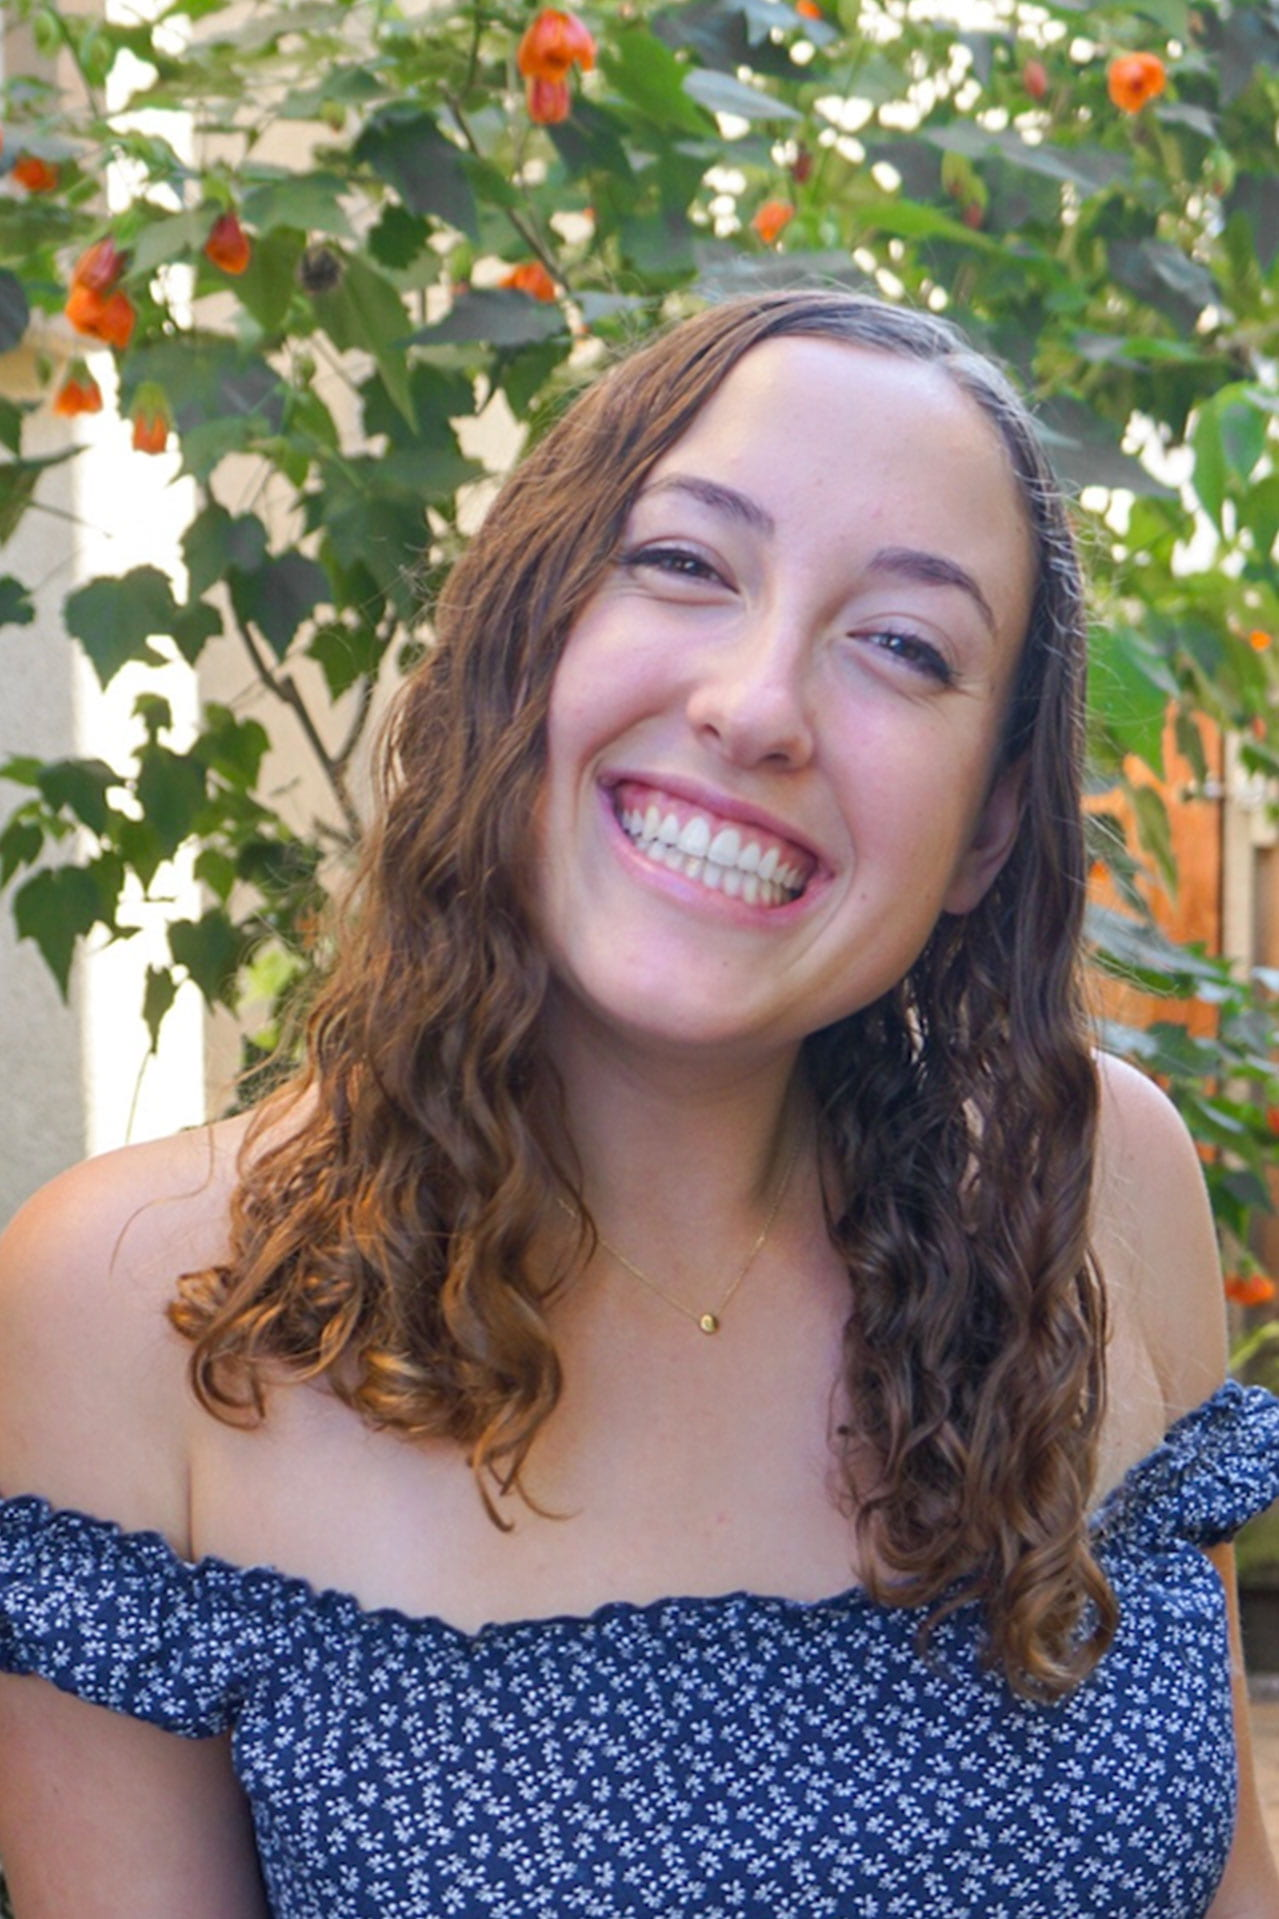 Emily McElroy